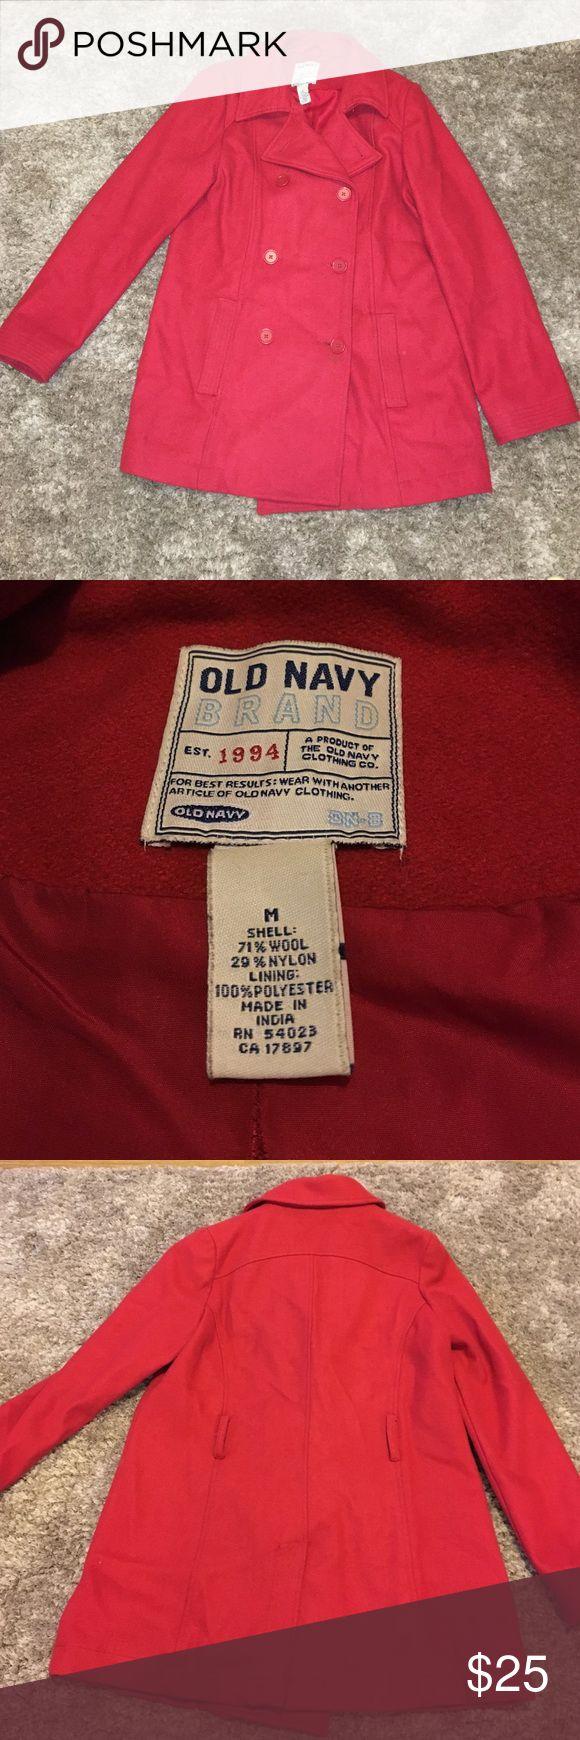 Red Old Navy pea coat Old Navy pea coat. Size Medium. Good used condition. Old Navy Jackets & Coats Pea Coats